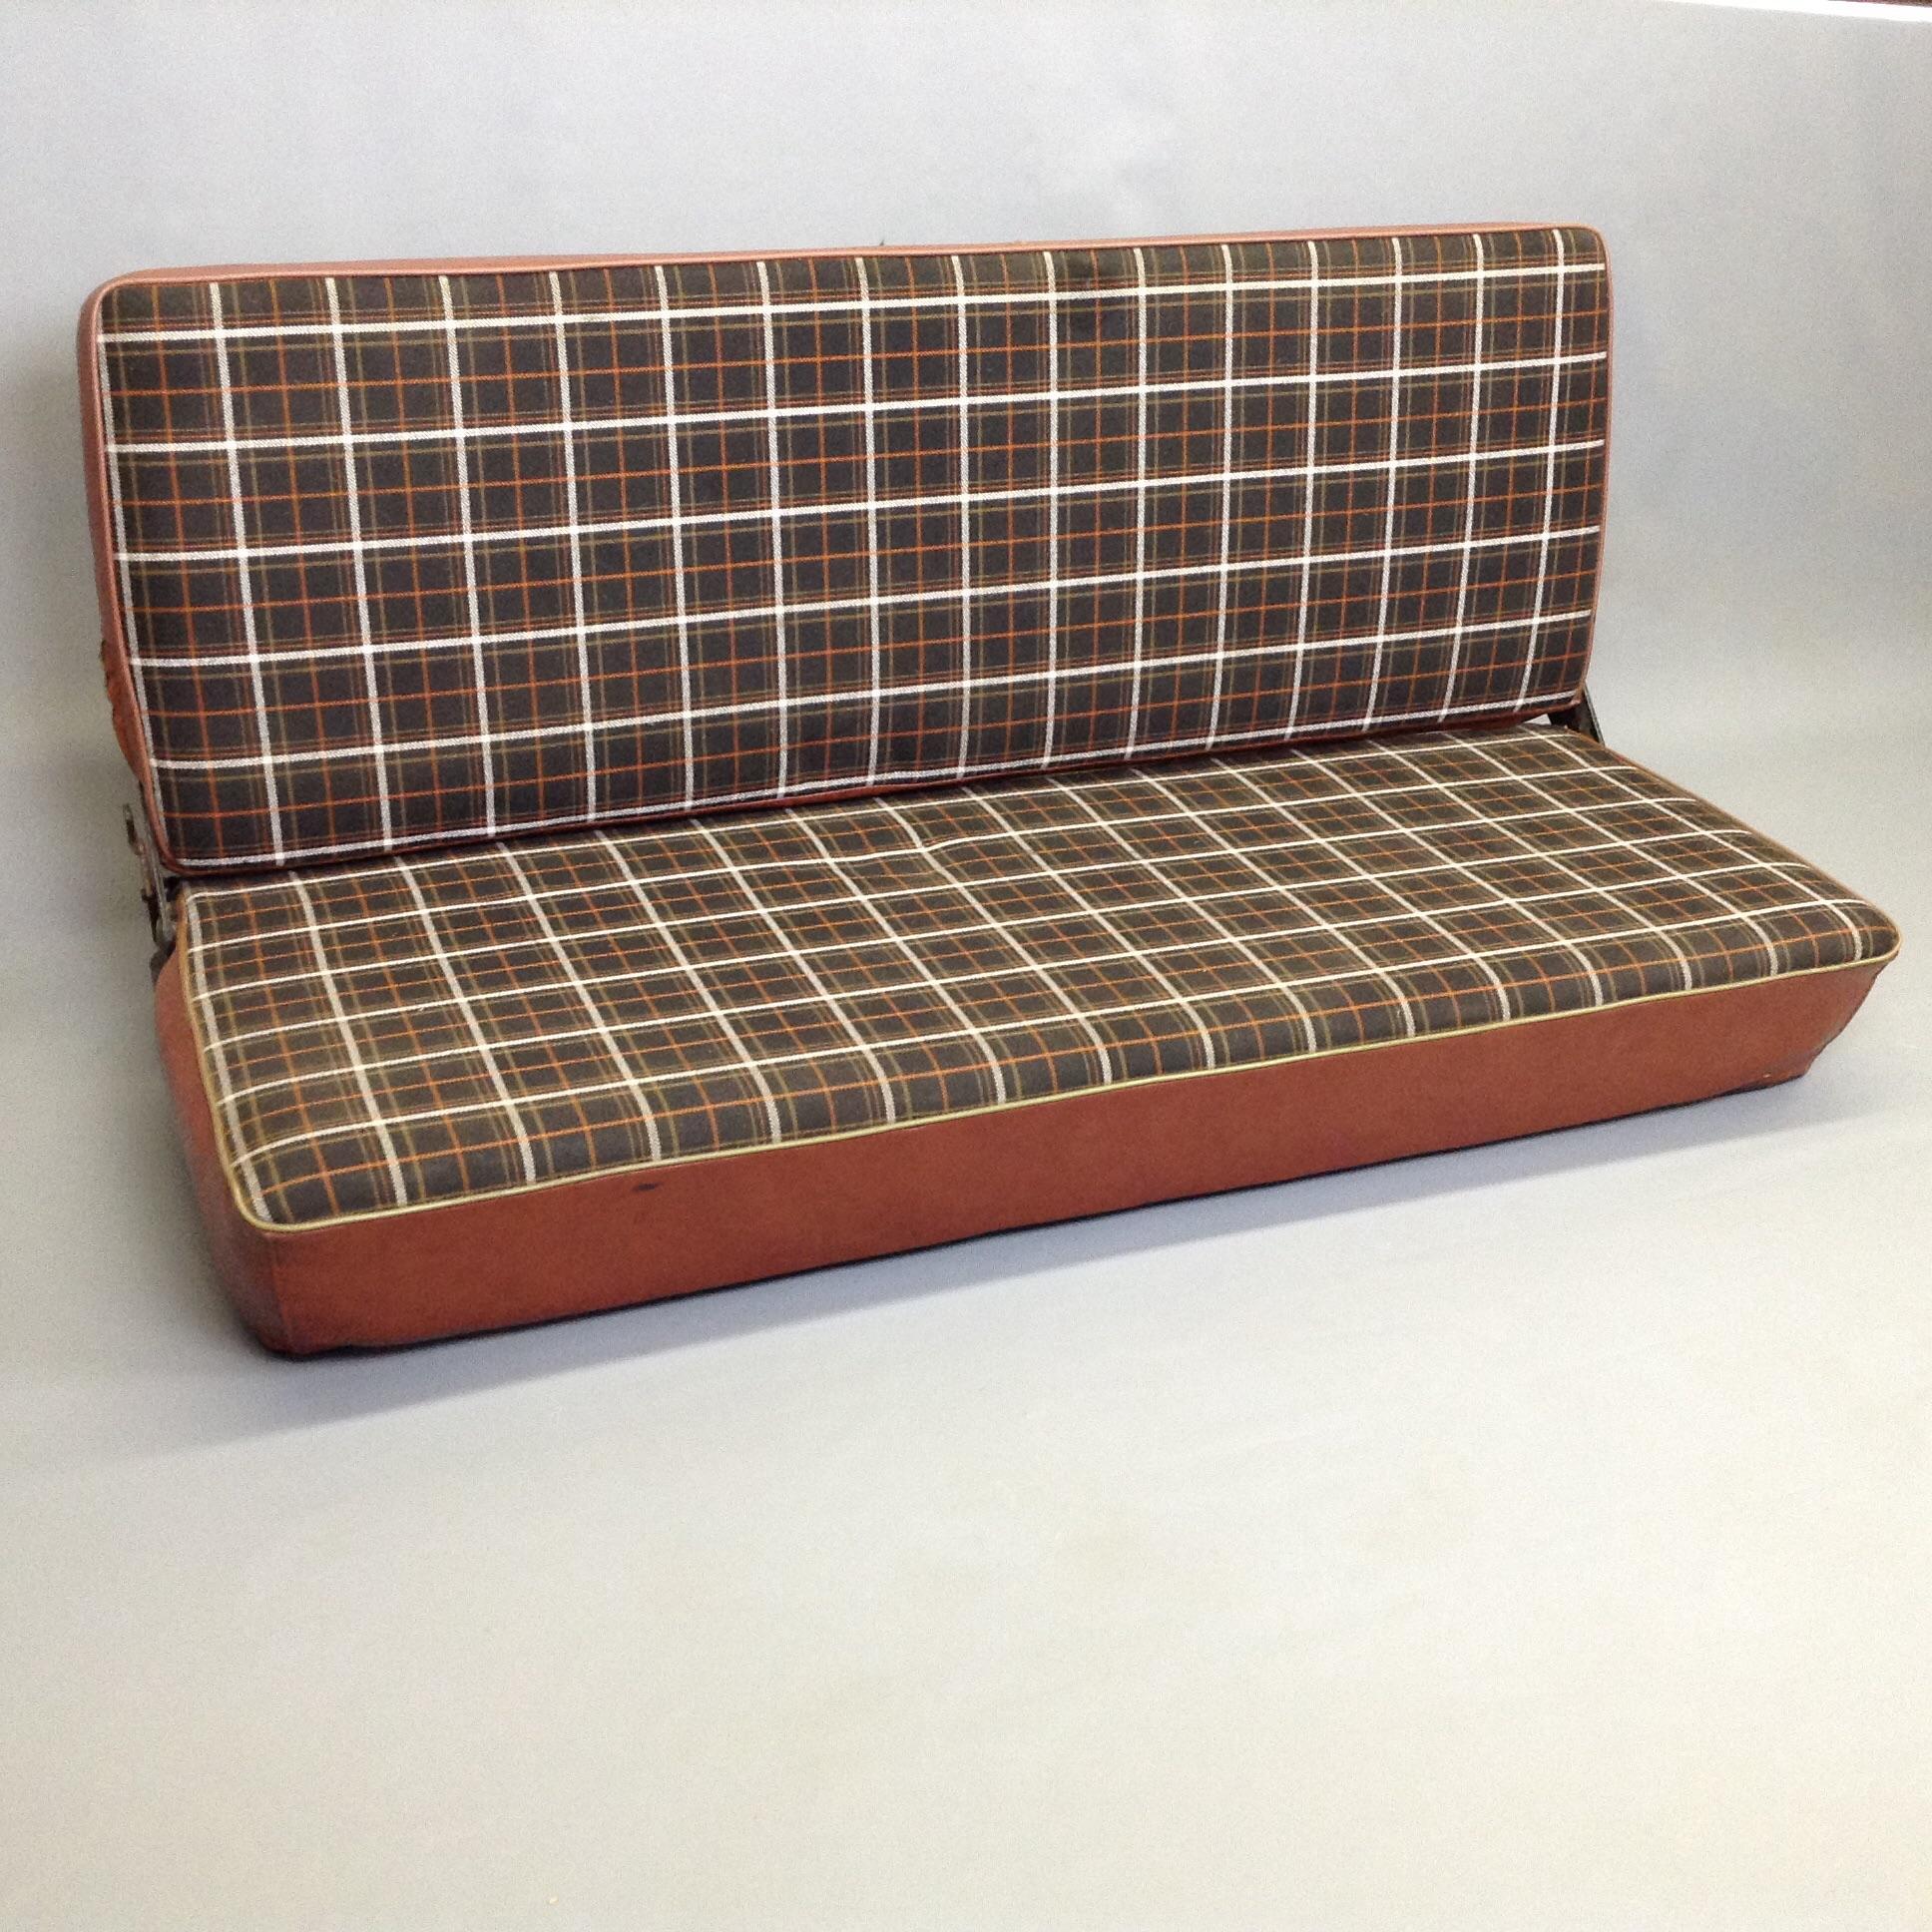 Stupendous Scout Traveler Russett Plaid Rear Bench Seat Dailytribune Chair Design For Home Dailytribuneorg